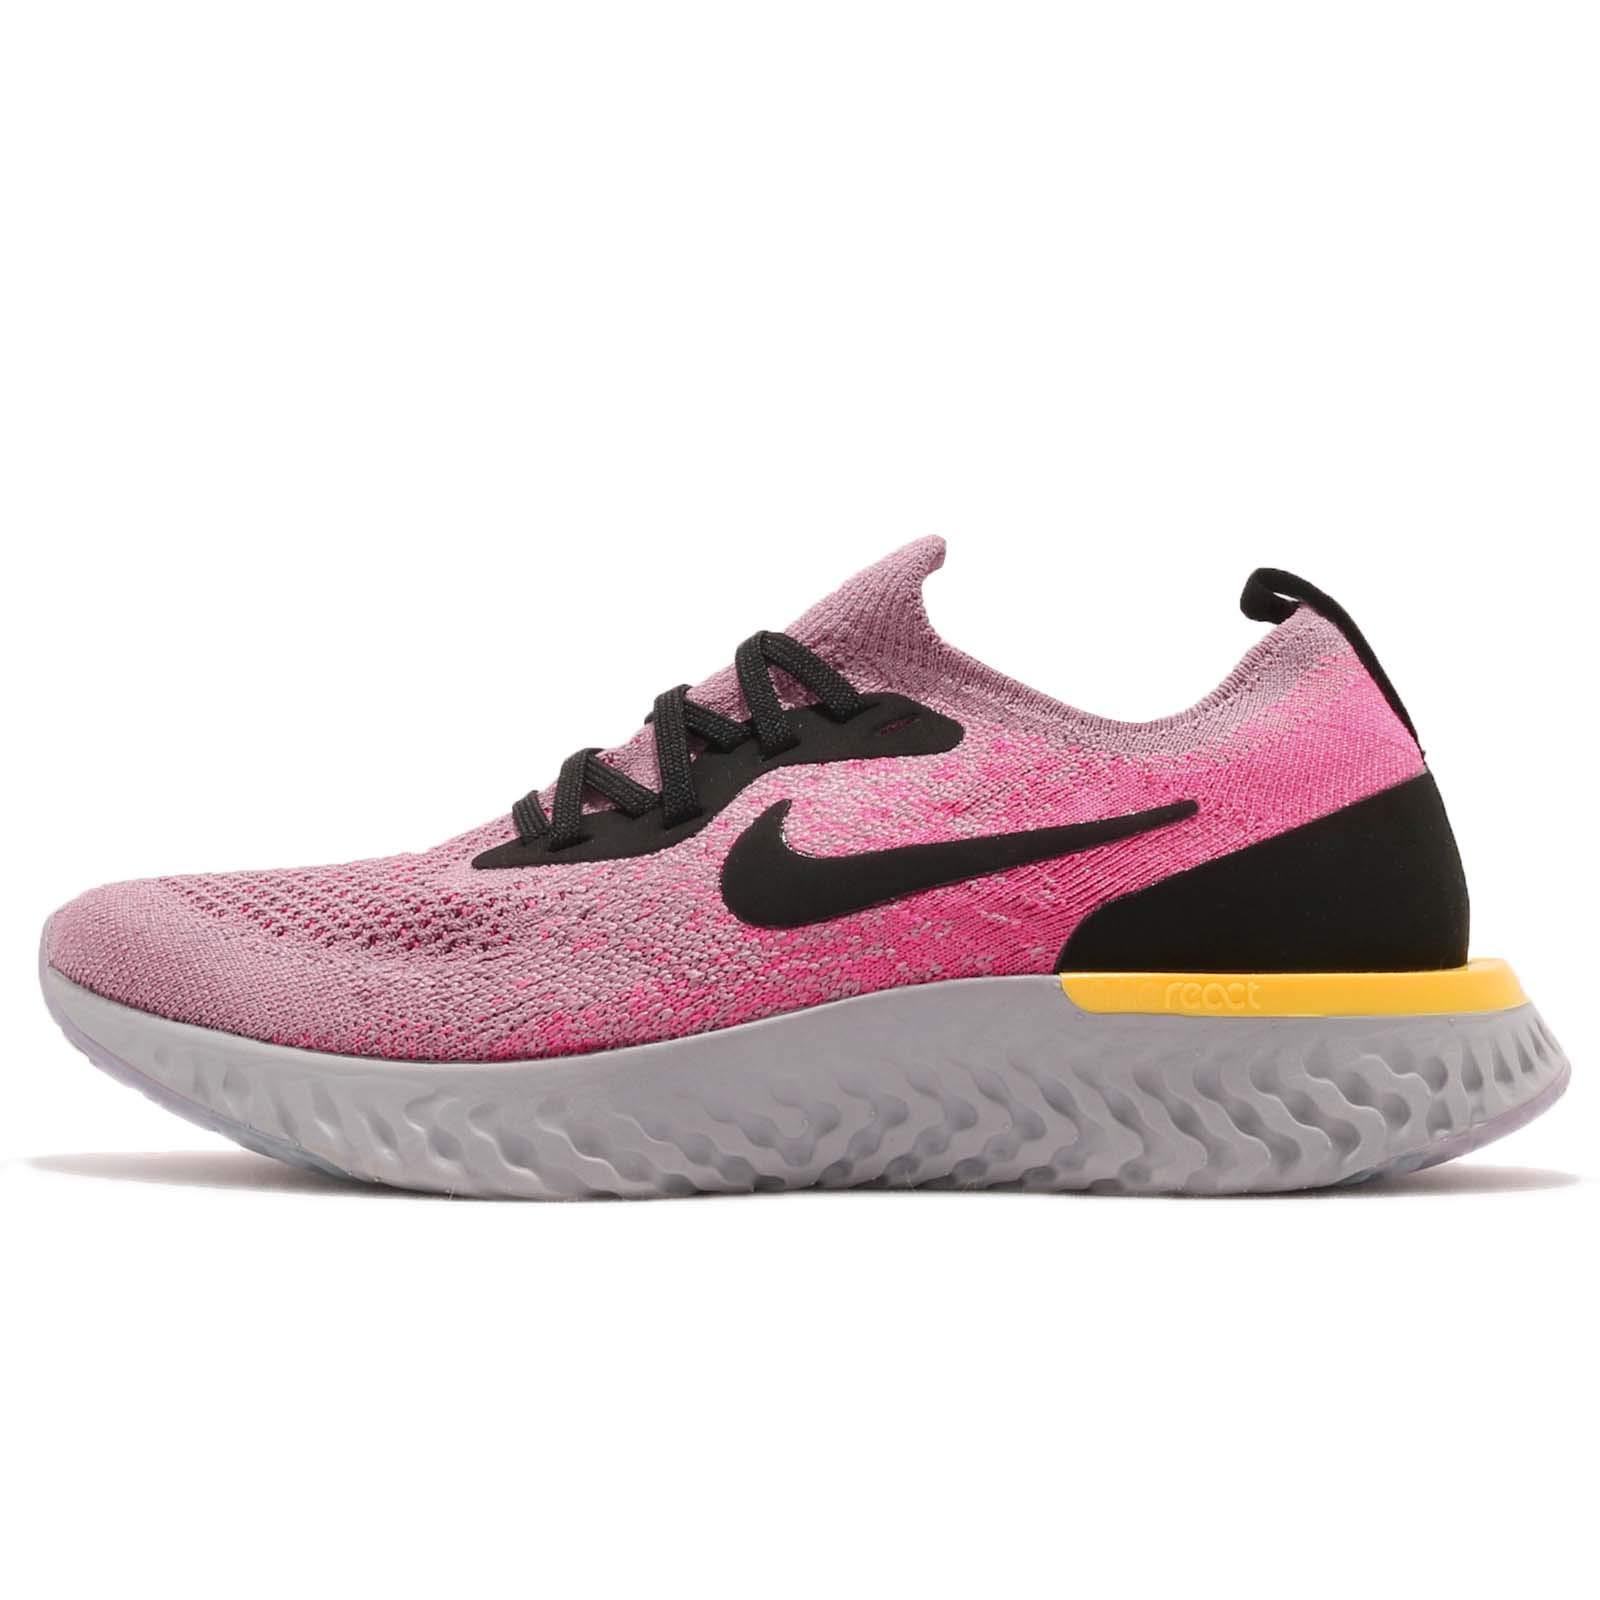 Nike Kid's Epic React Flyknit GS, Plum DUST/Black-Pink Blast, Youth Size 6